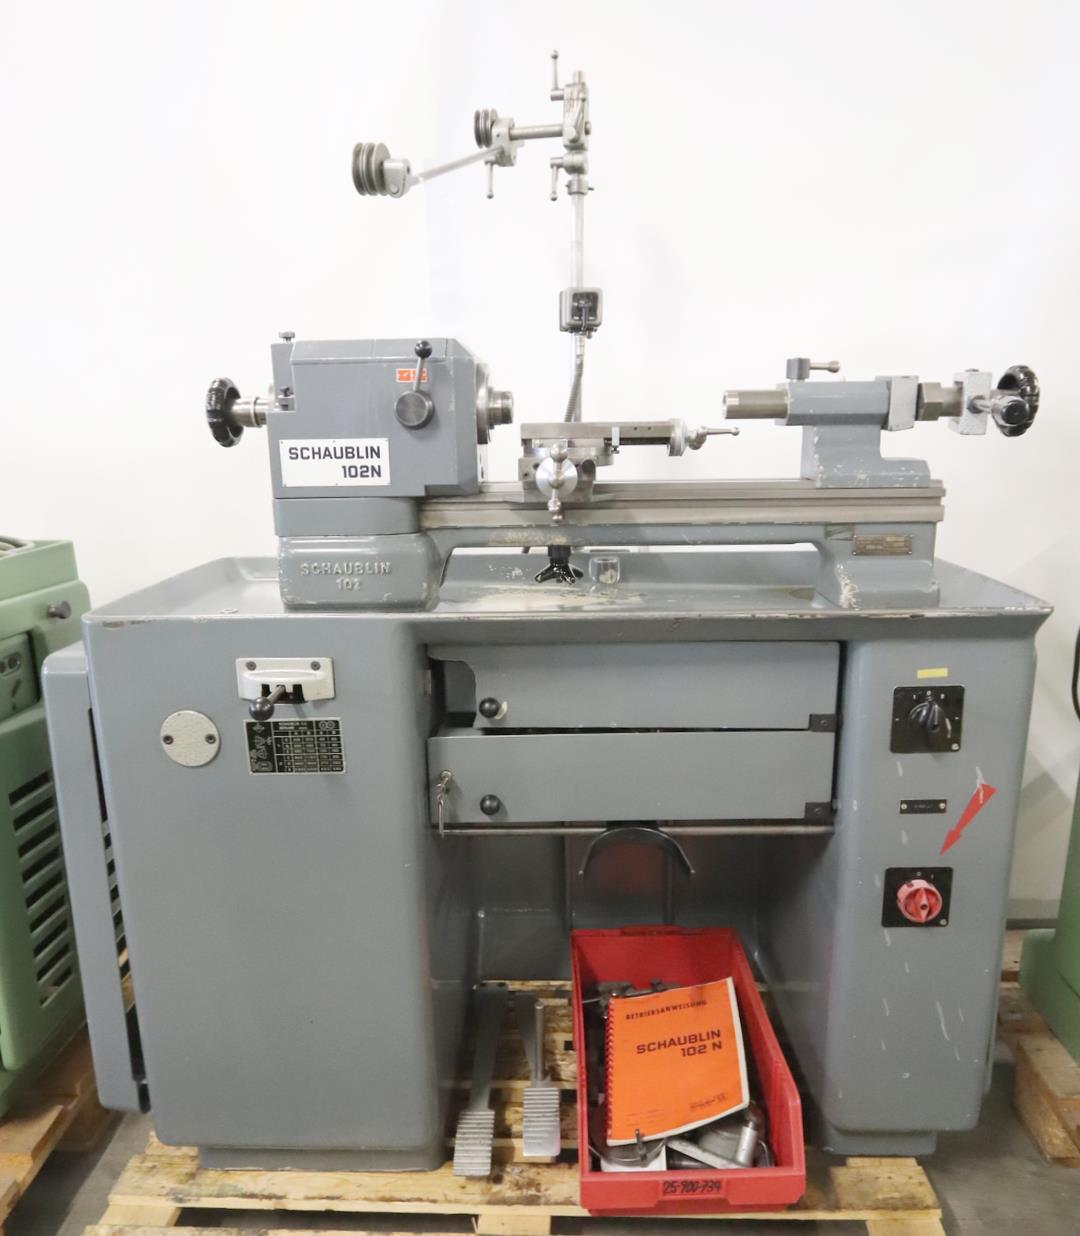 Schaublin 102n 80 tour outilleur machine outil d 39 occasion for Piccolo tornio usato